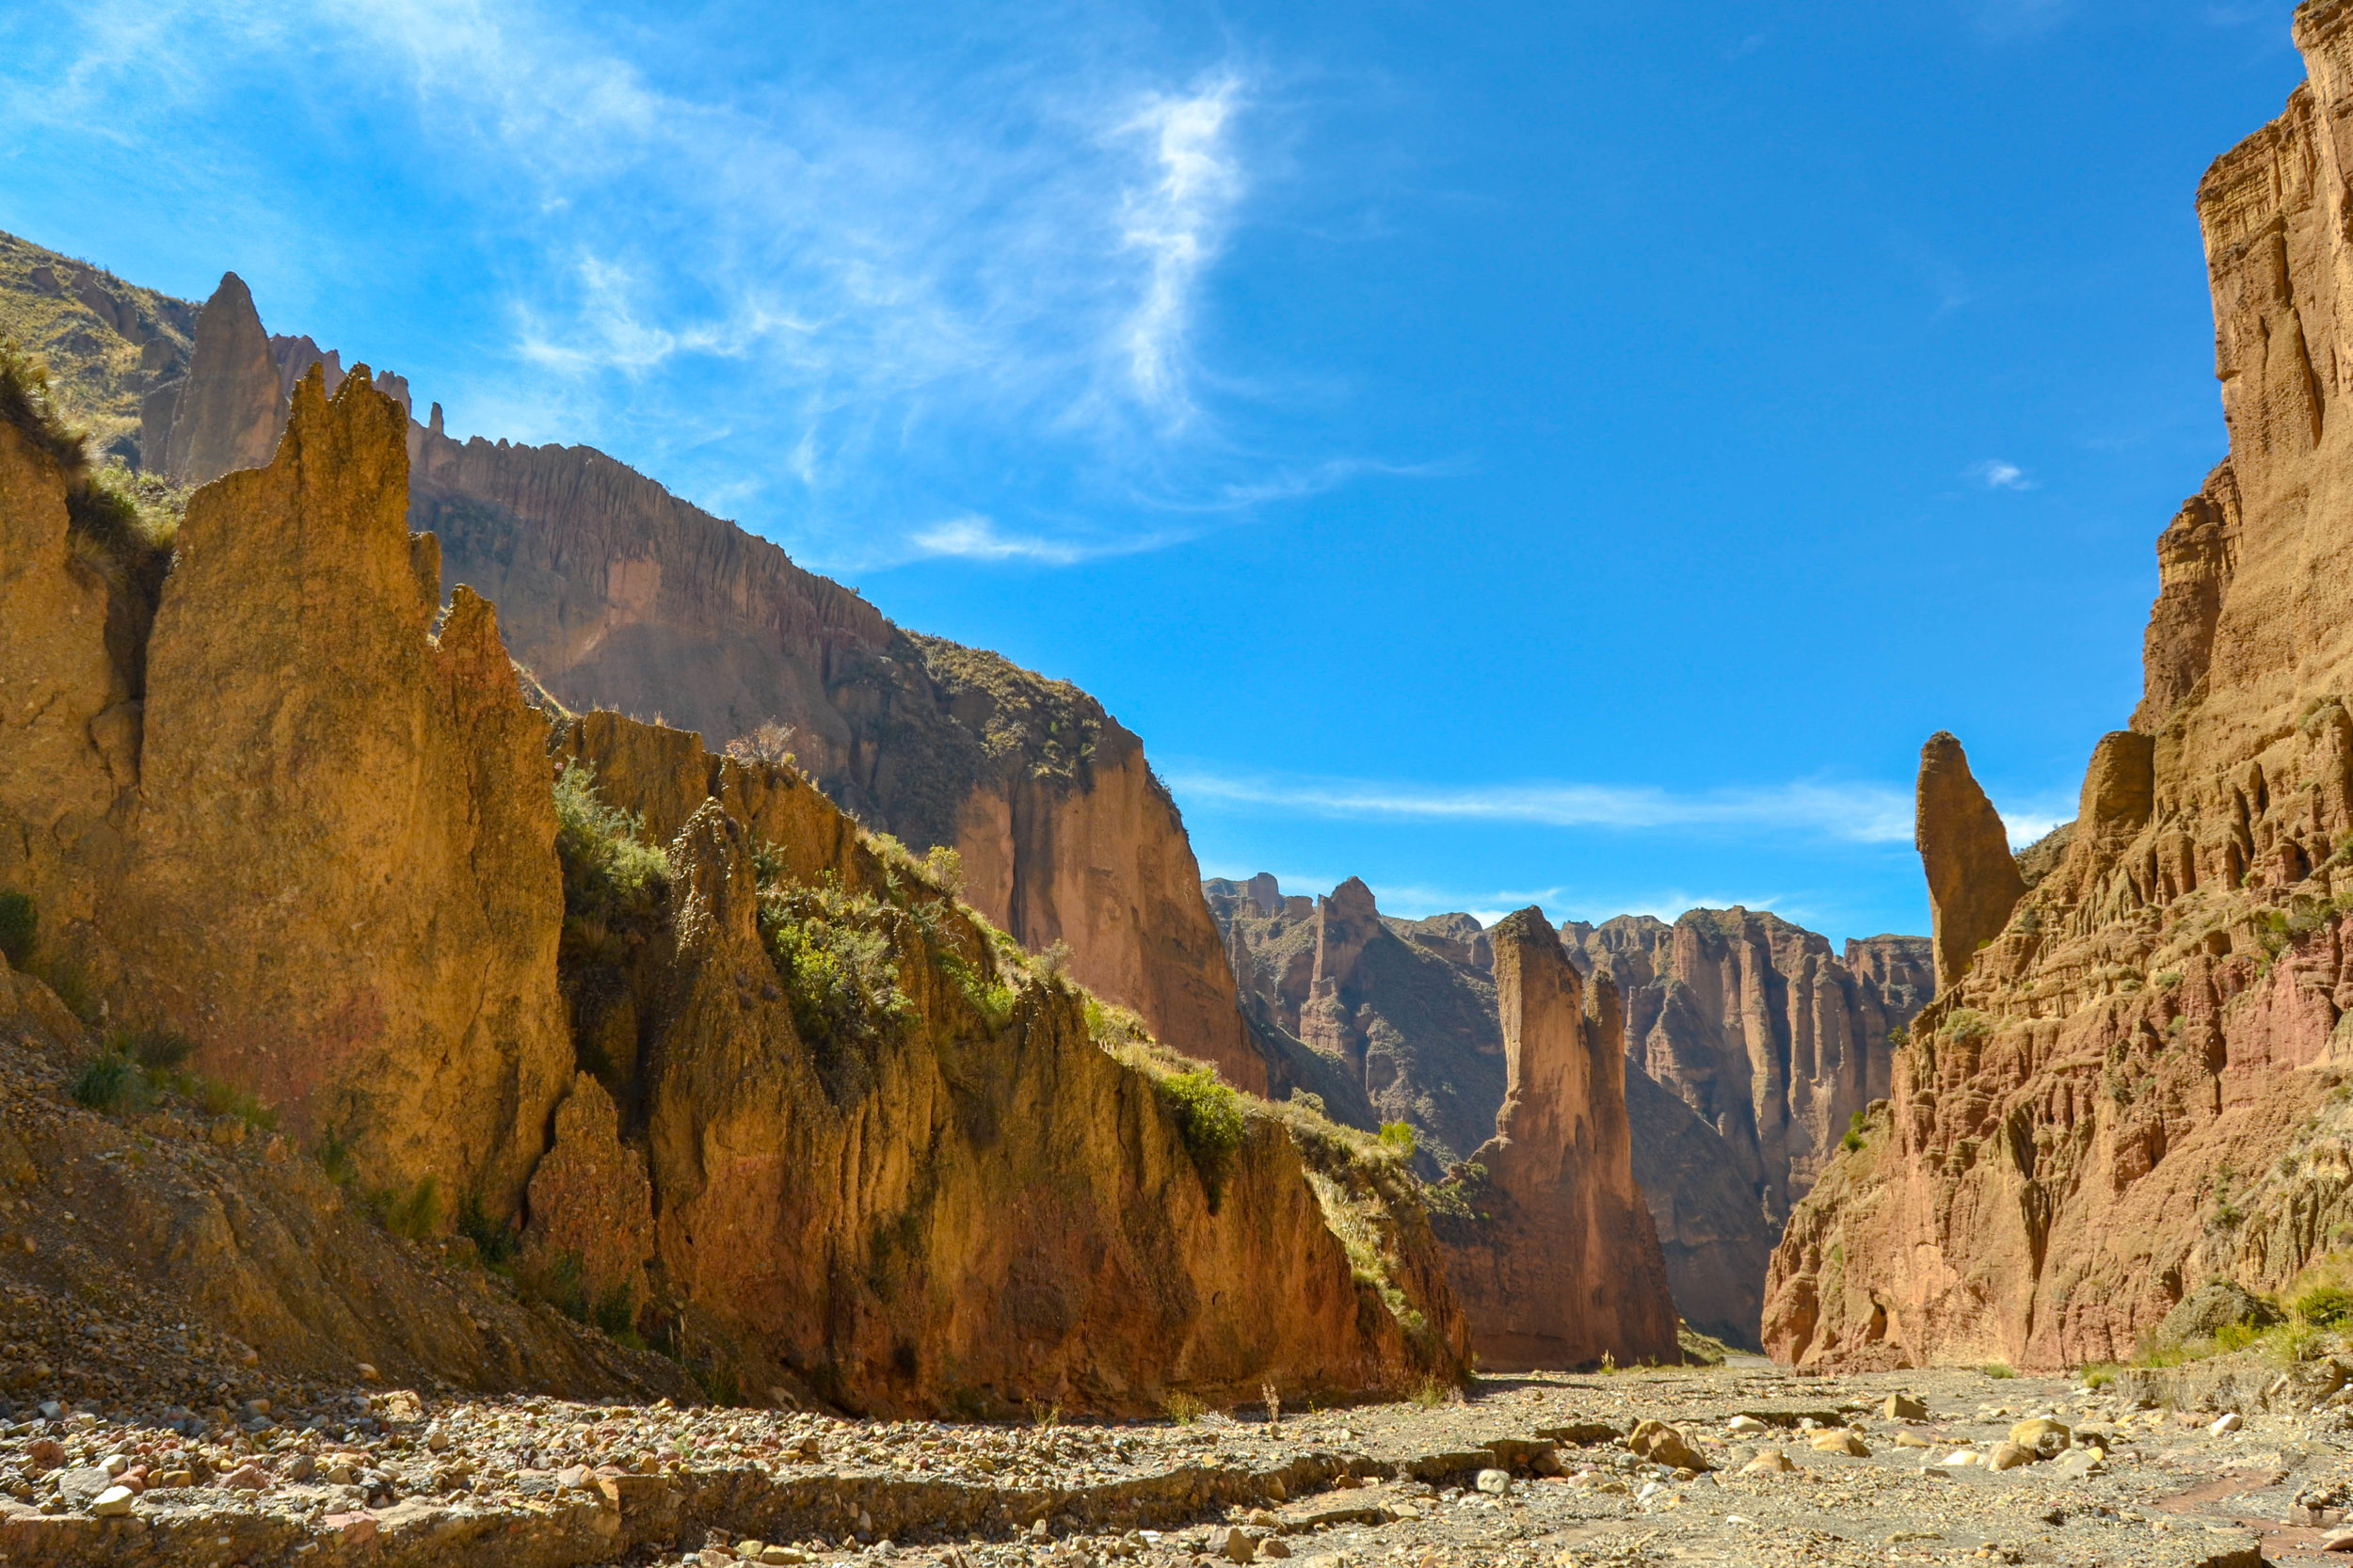 The interior of Palca Canyon